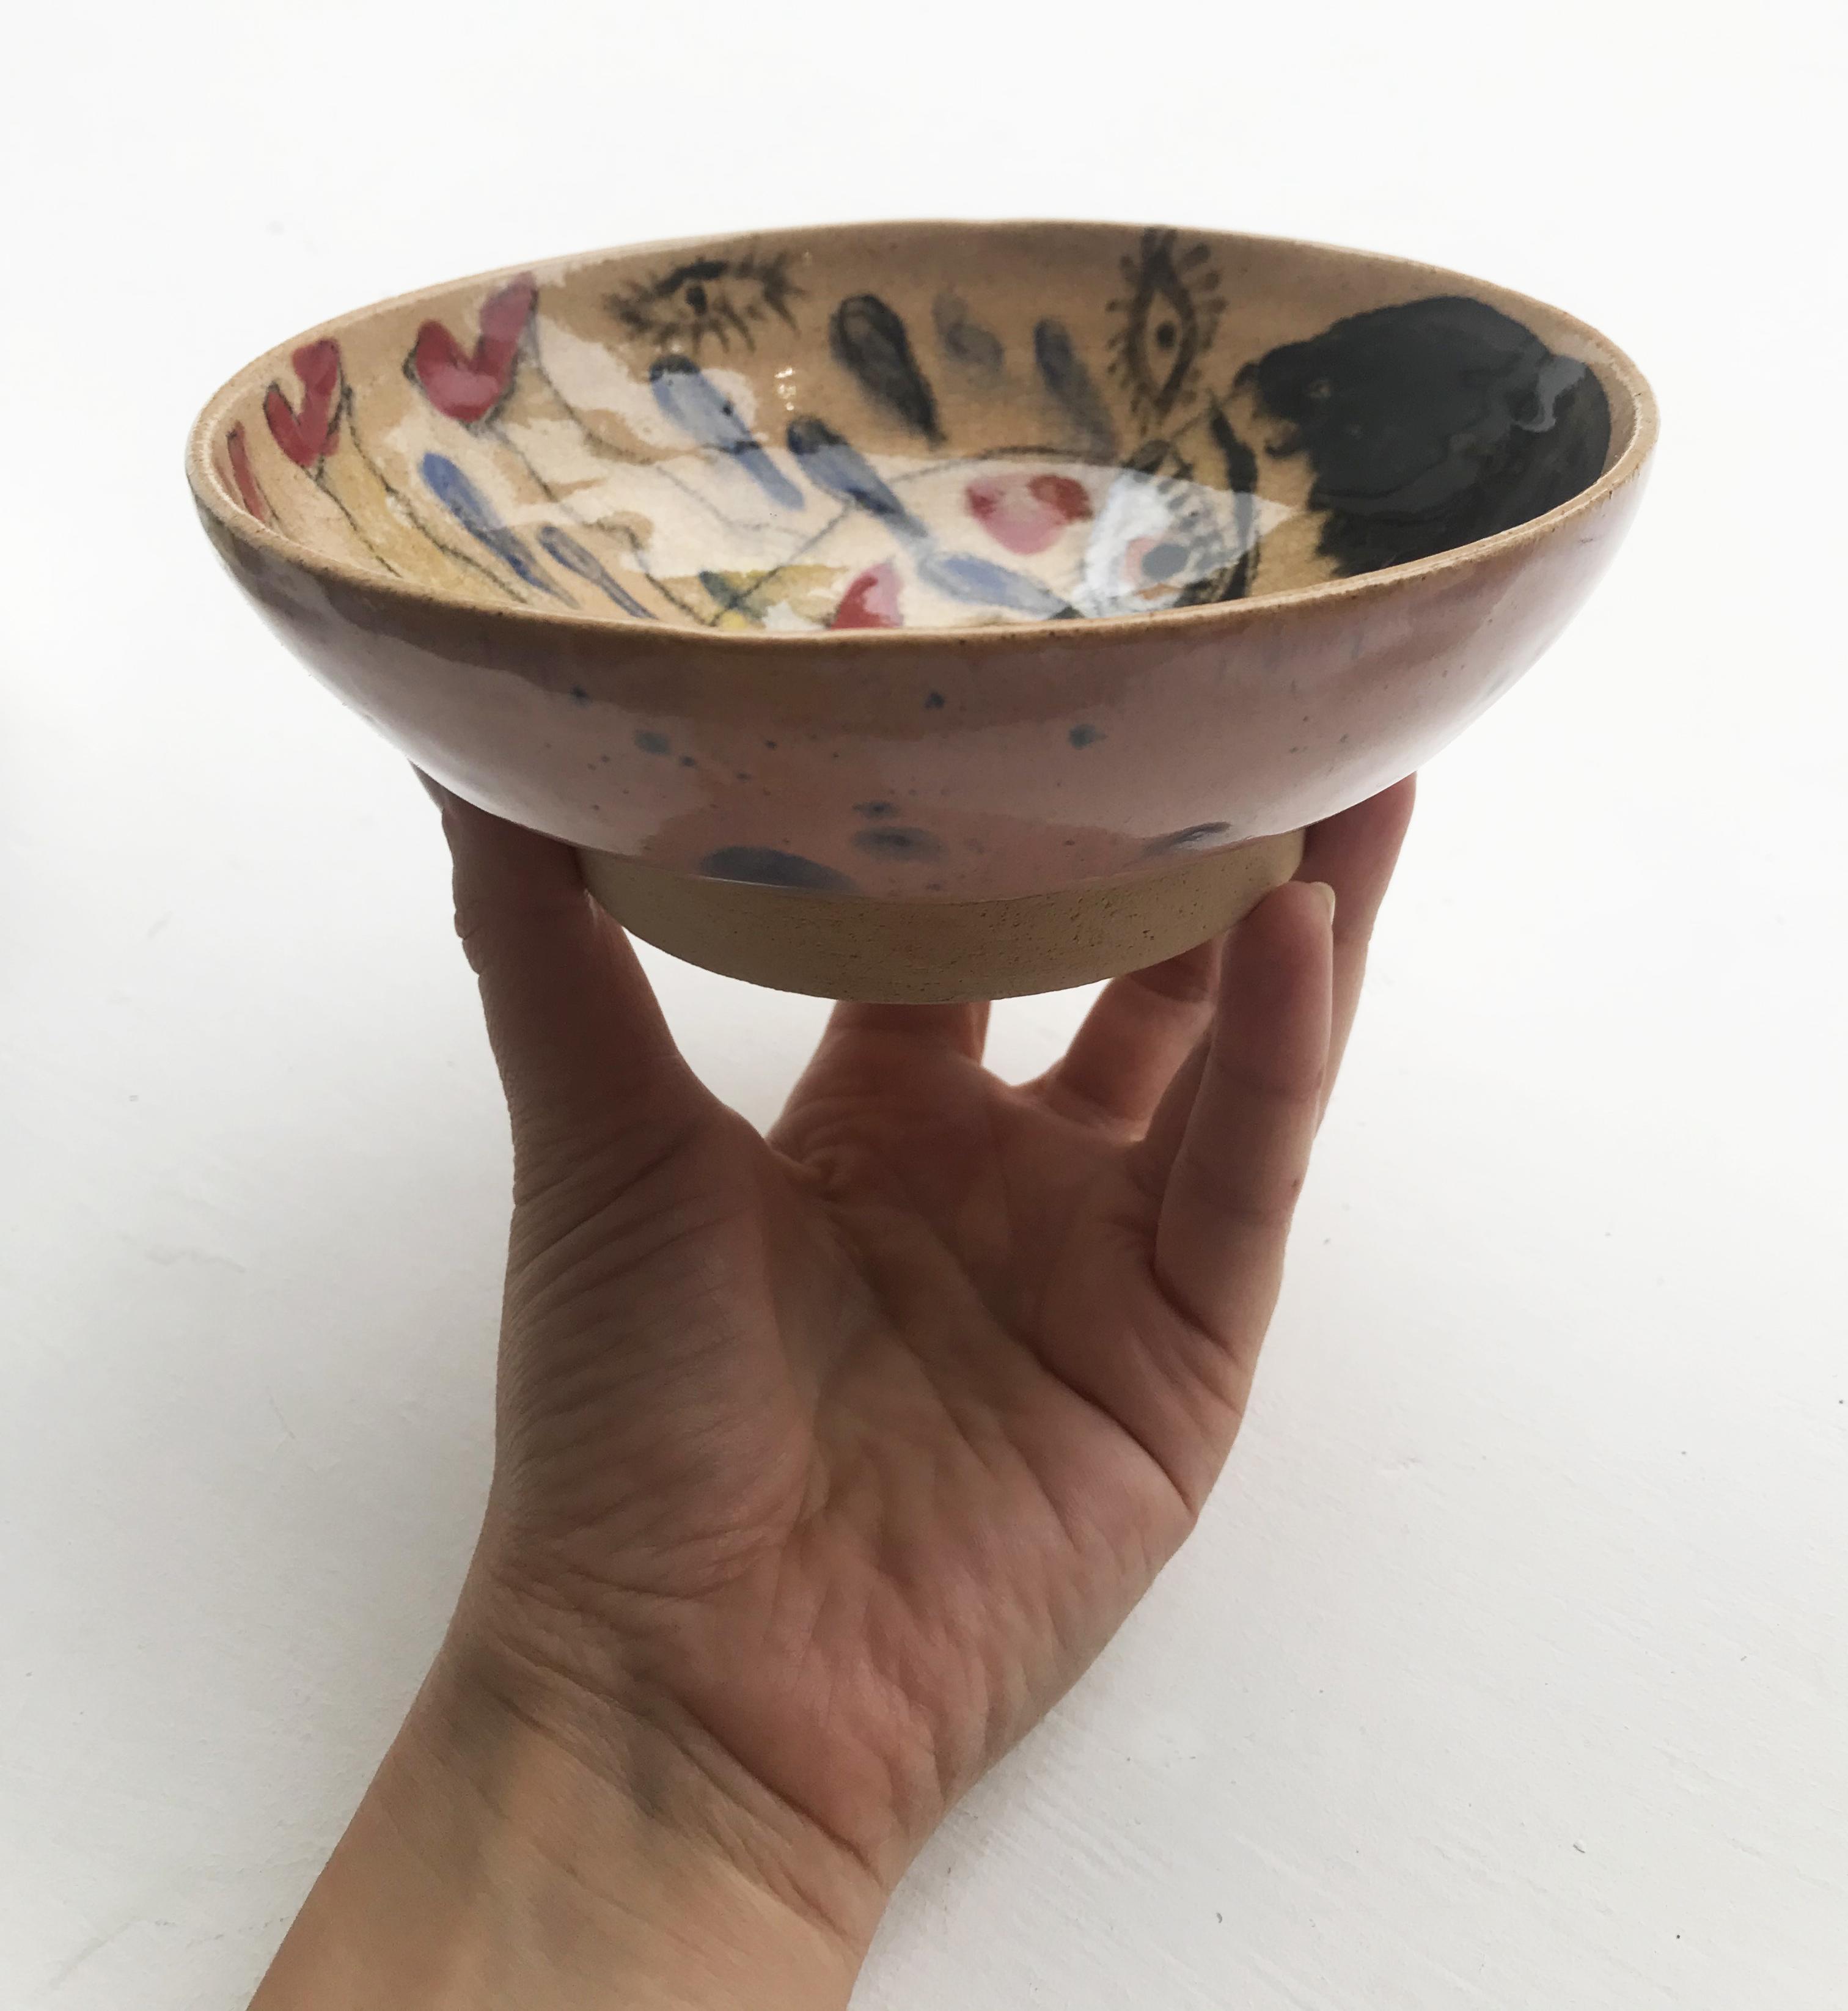 4 Leg Girl Ceramic Collaboration